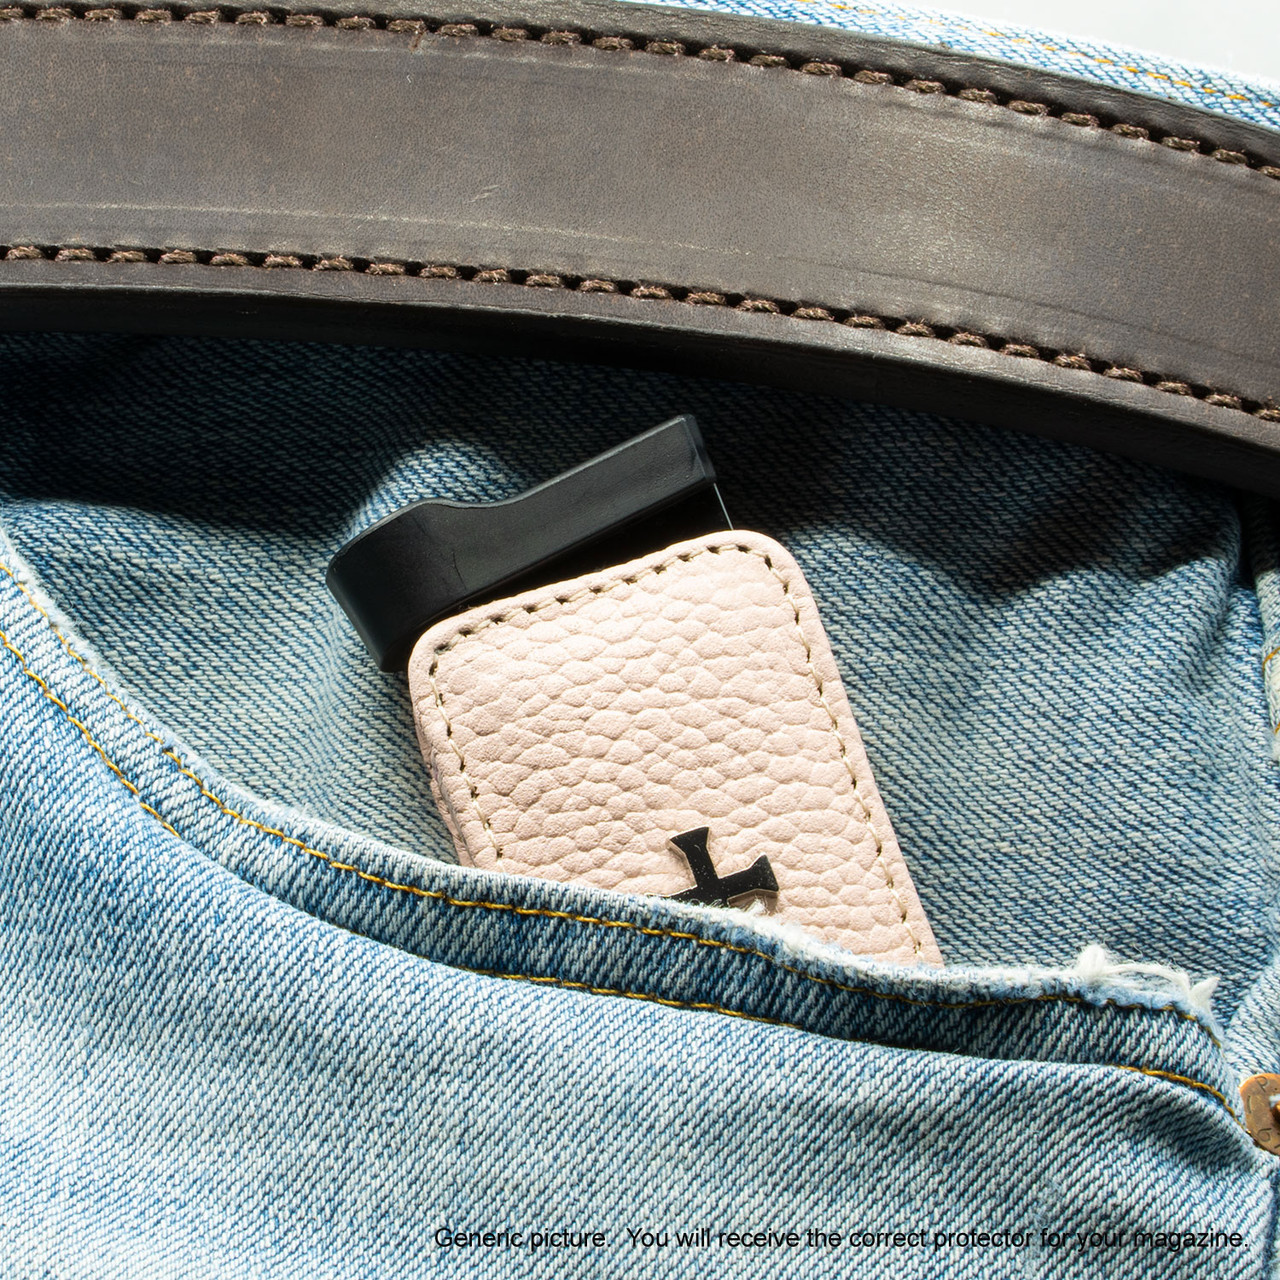 S&W SW9V Pink Carry Faithfully Cross Magazine Pocket Protector